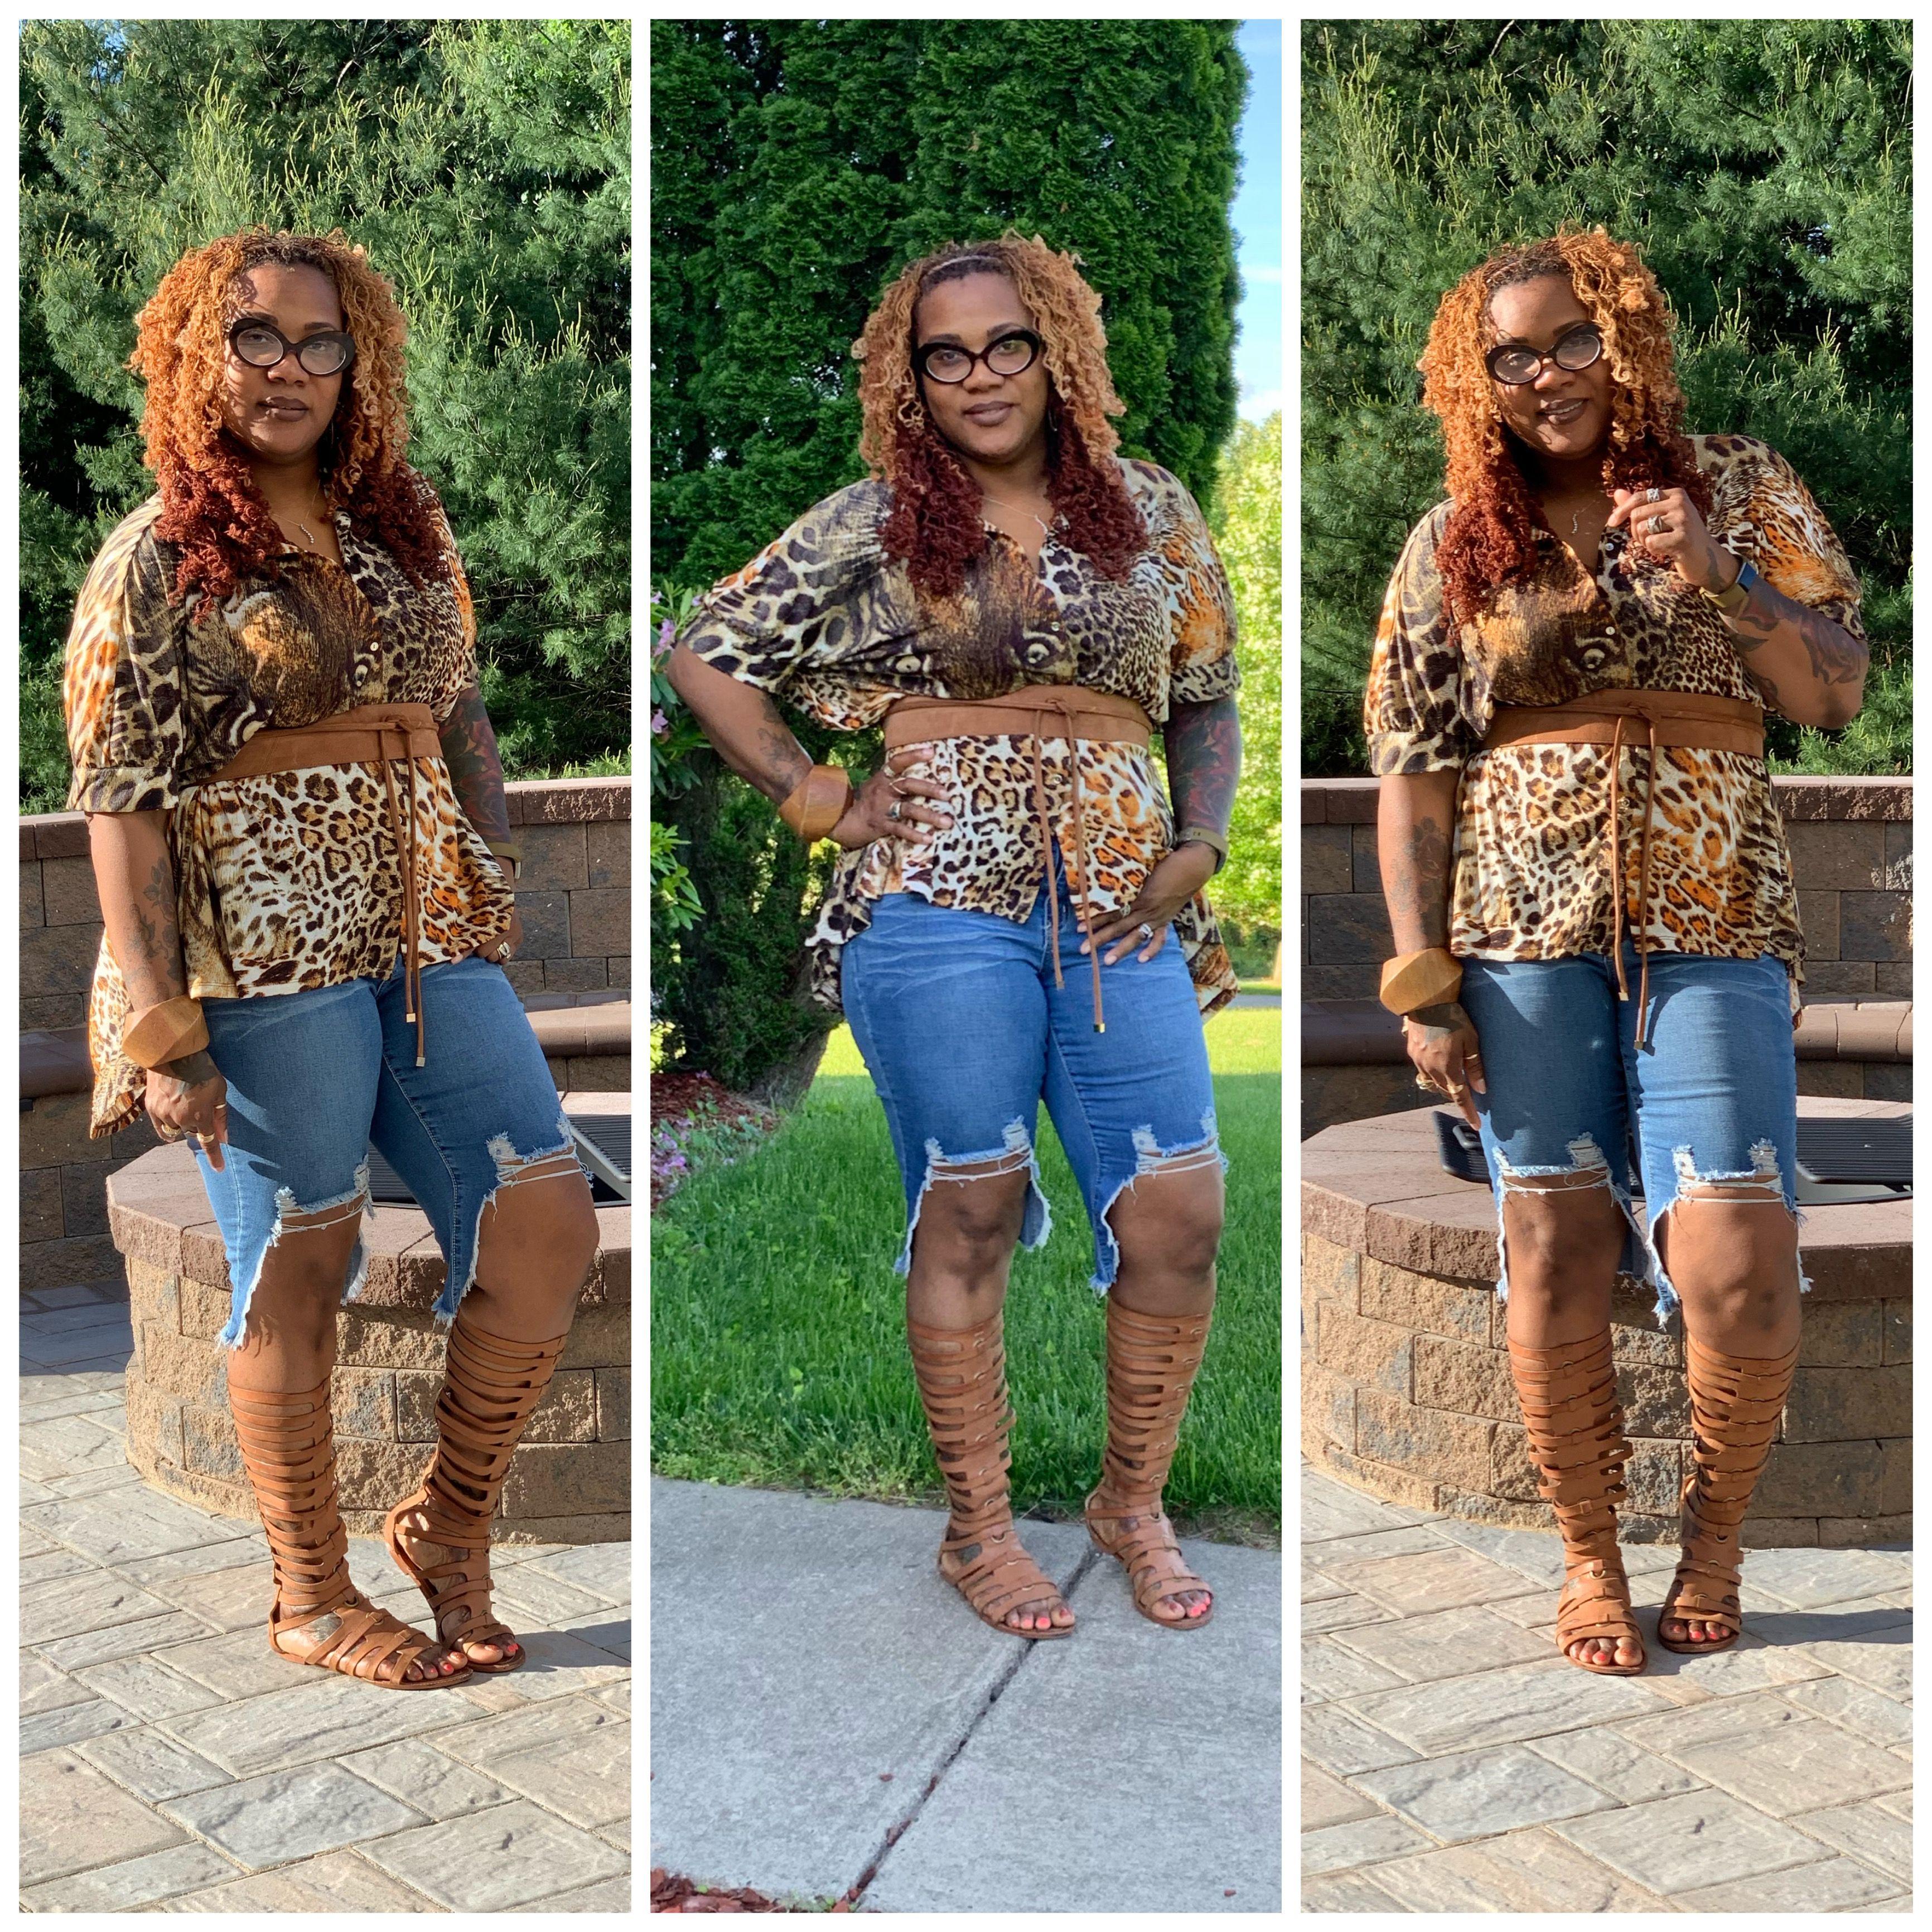 That Girl S Closet Tanyika Www Thatgirlscloset Com Animal Print High Low Shirt High Low Destructed Short Short Gladiator Sandals Fashion Lifestyle Blog Fashion